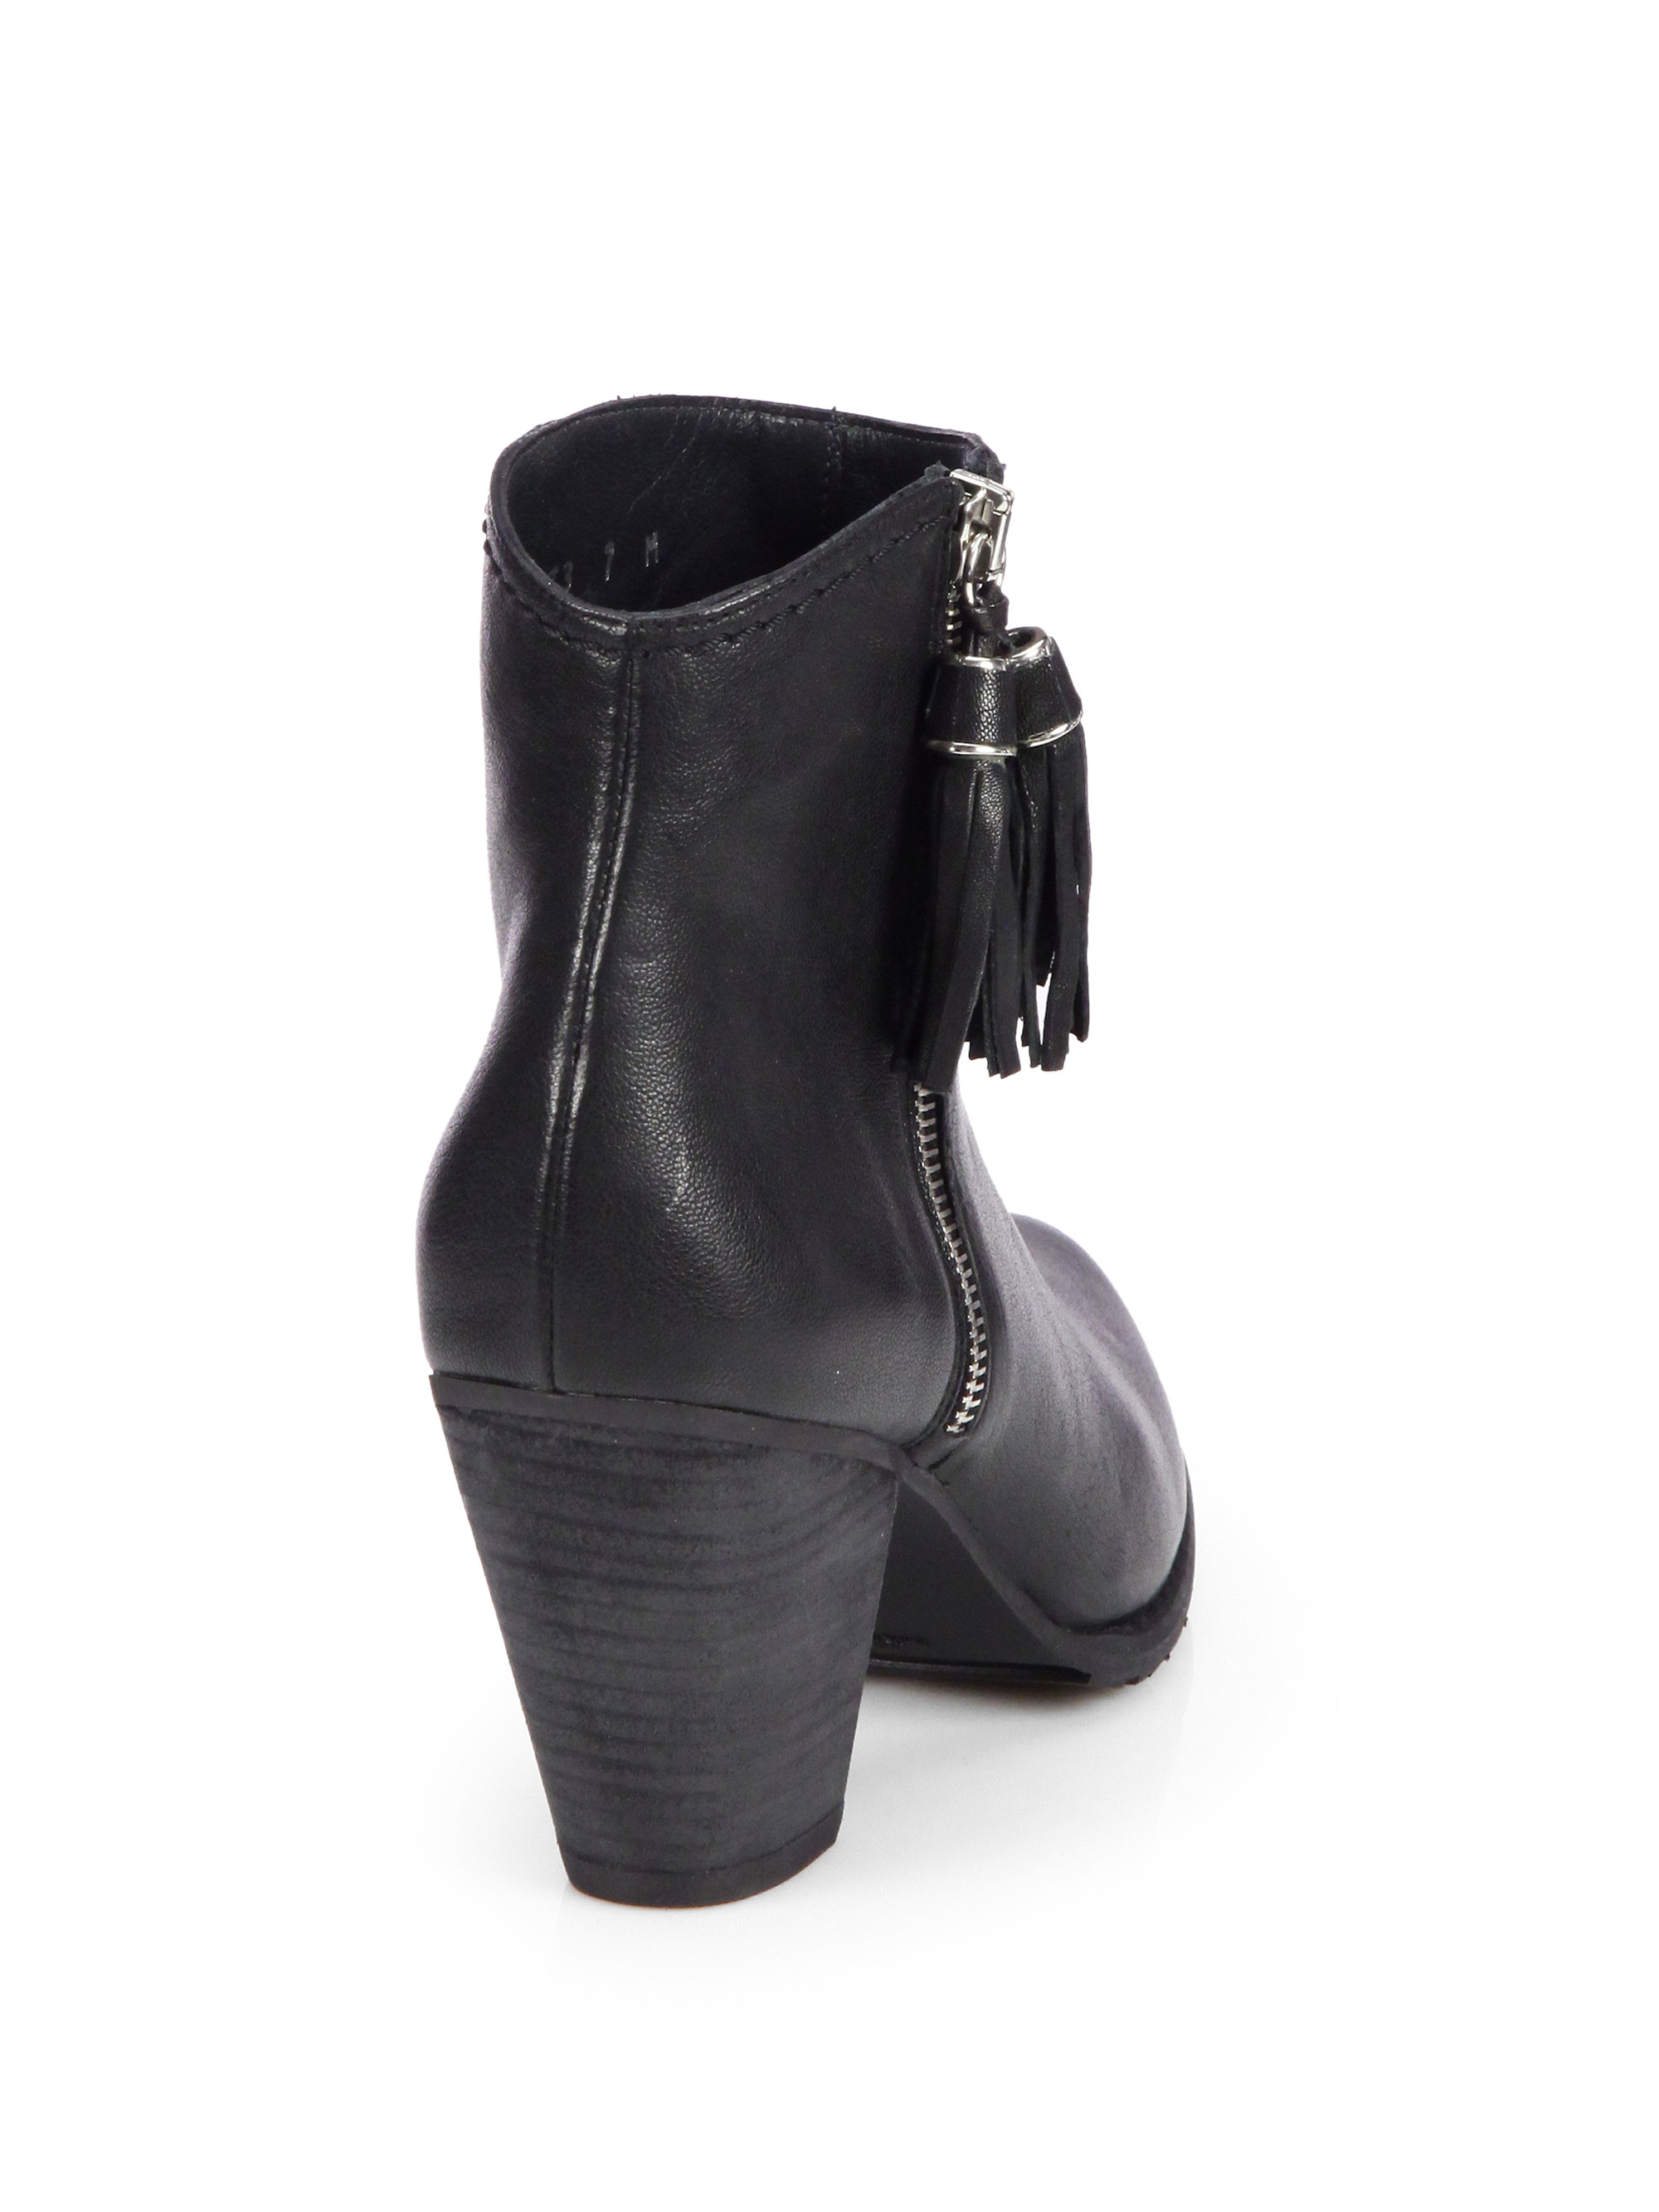 Stuart Weitzman Nuprancing Ankle Boots buy cheap browse free shipping low shipping fee BALiz7u